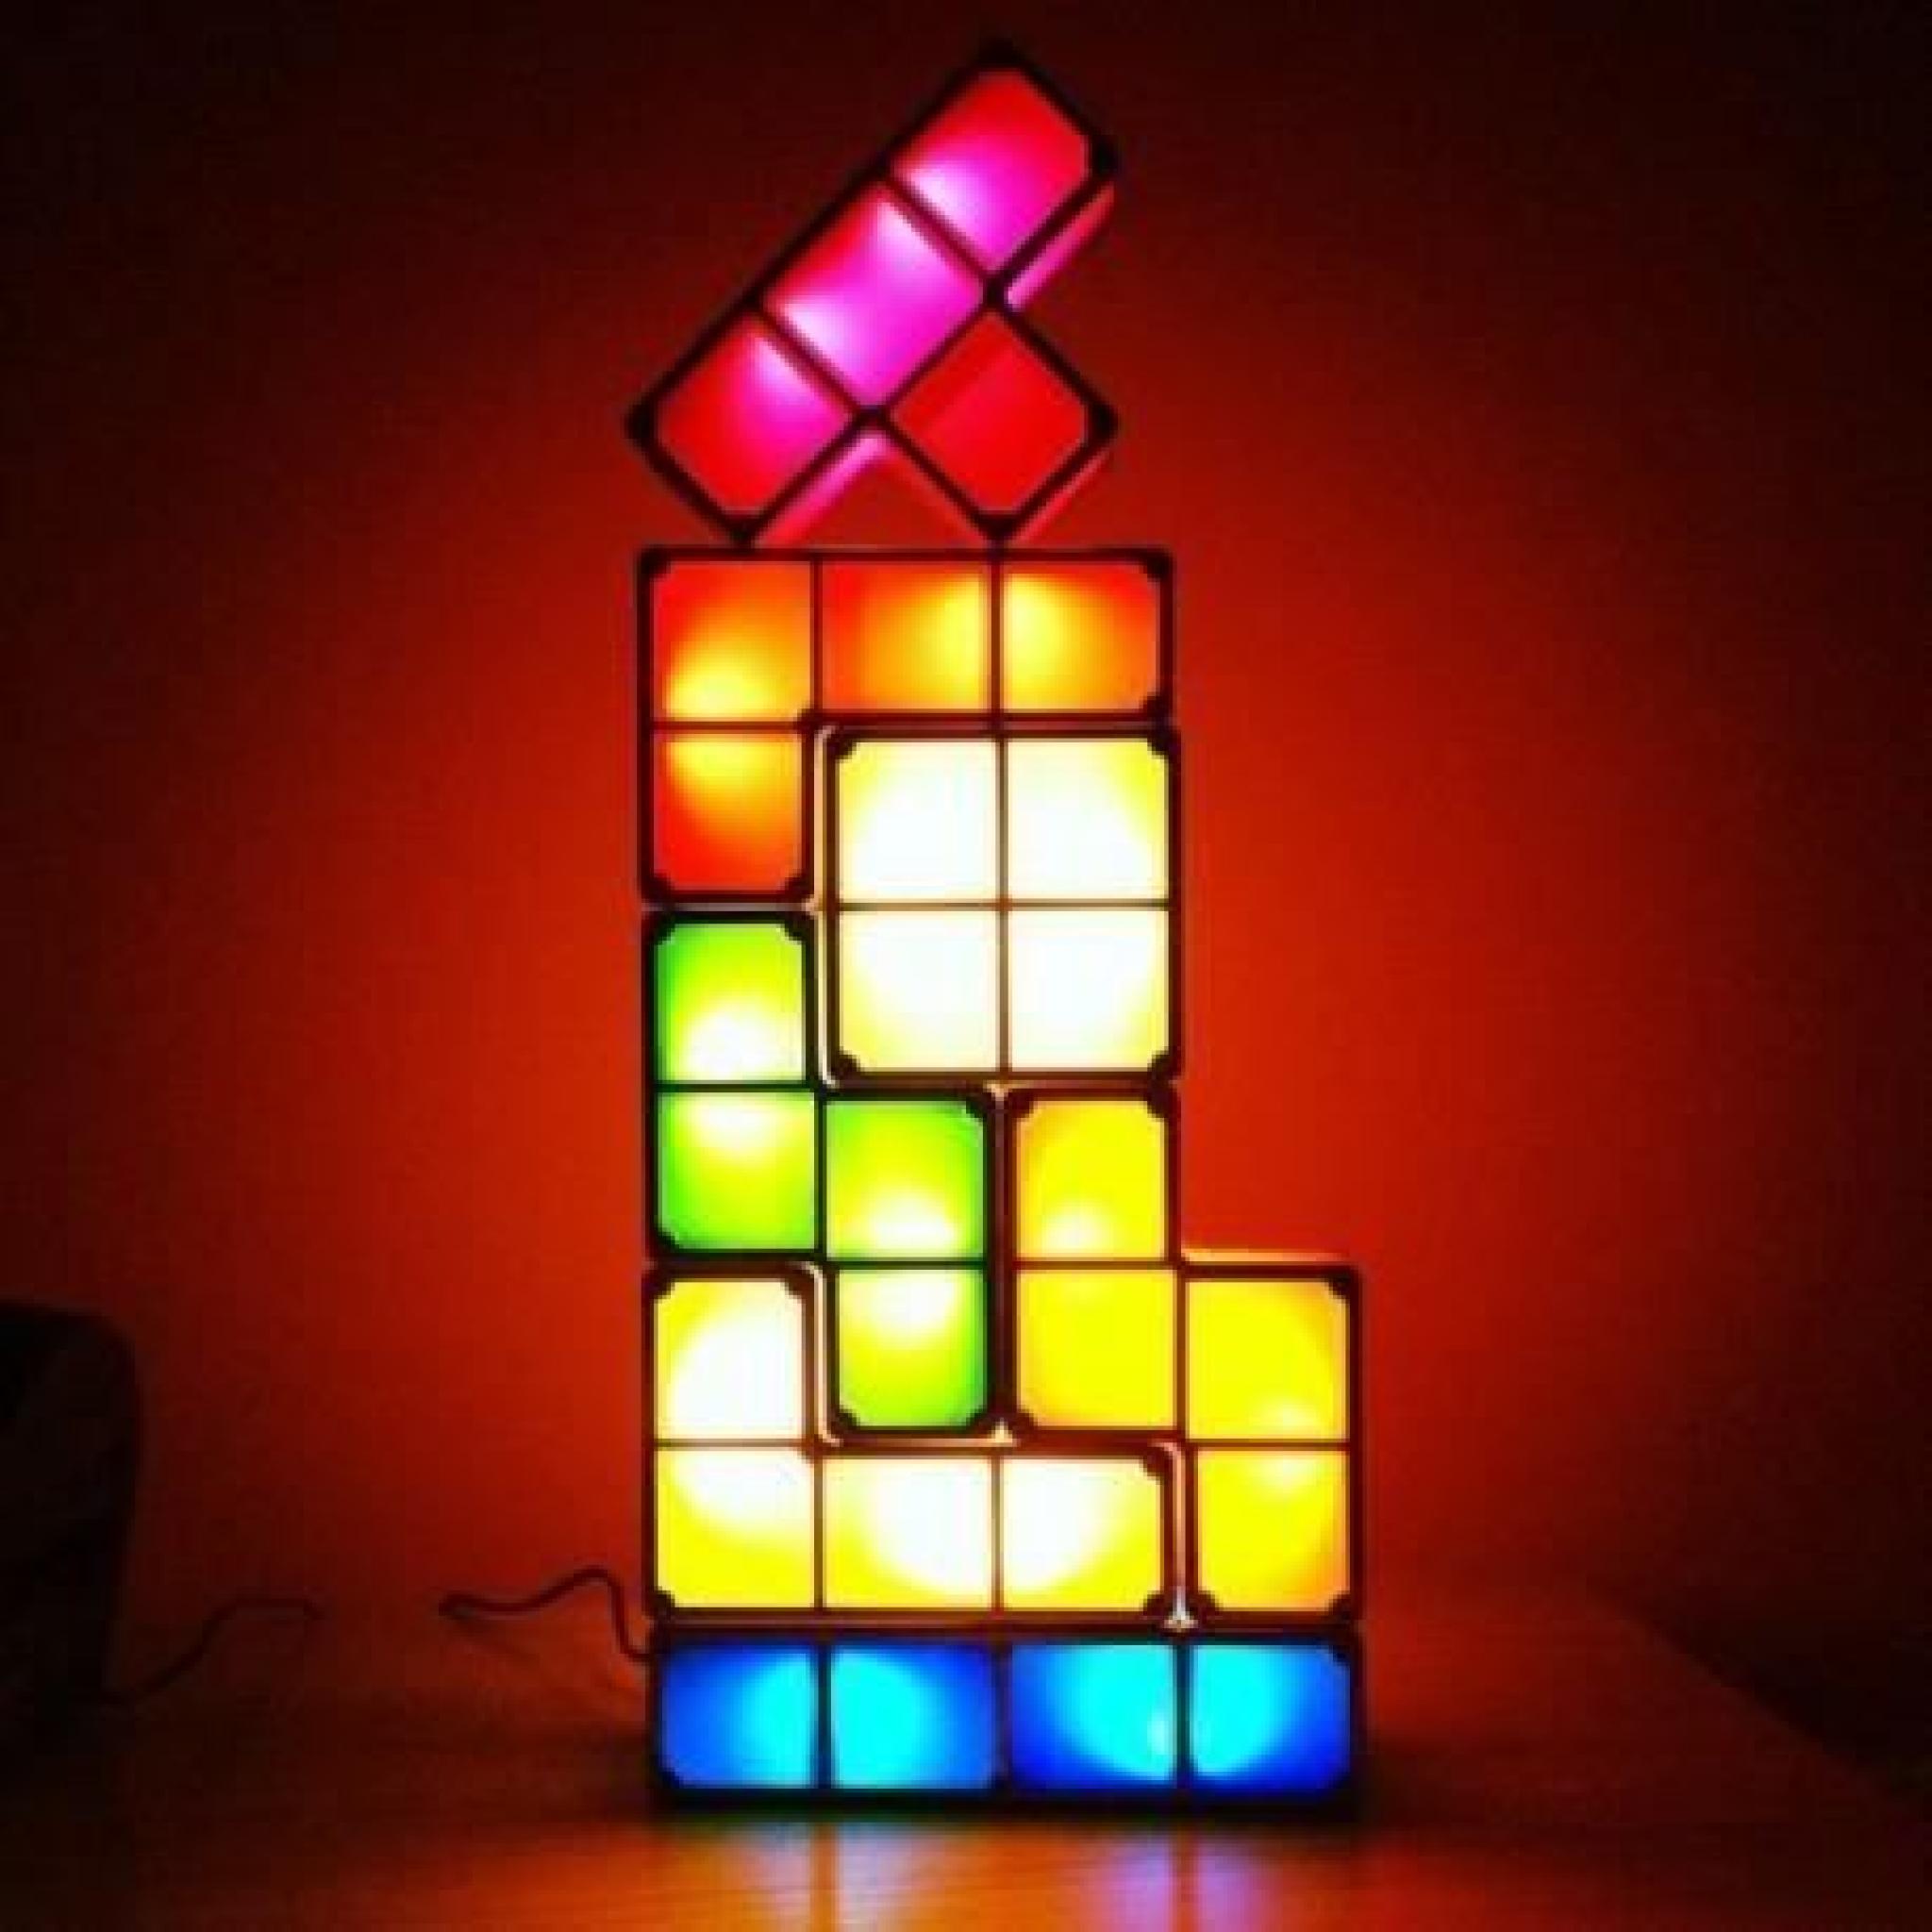 Lampe Tetris Tetris Design Lampe Modulable NnwOv8m0